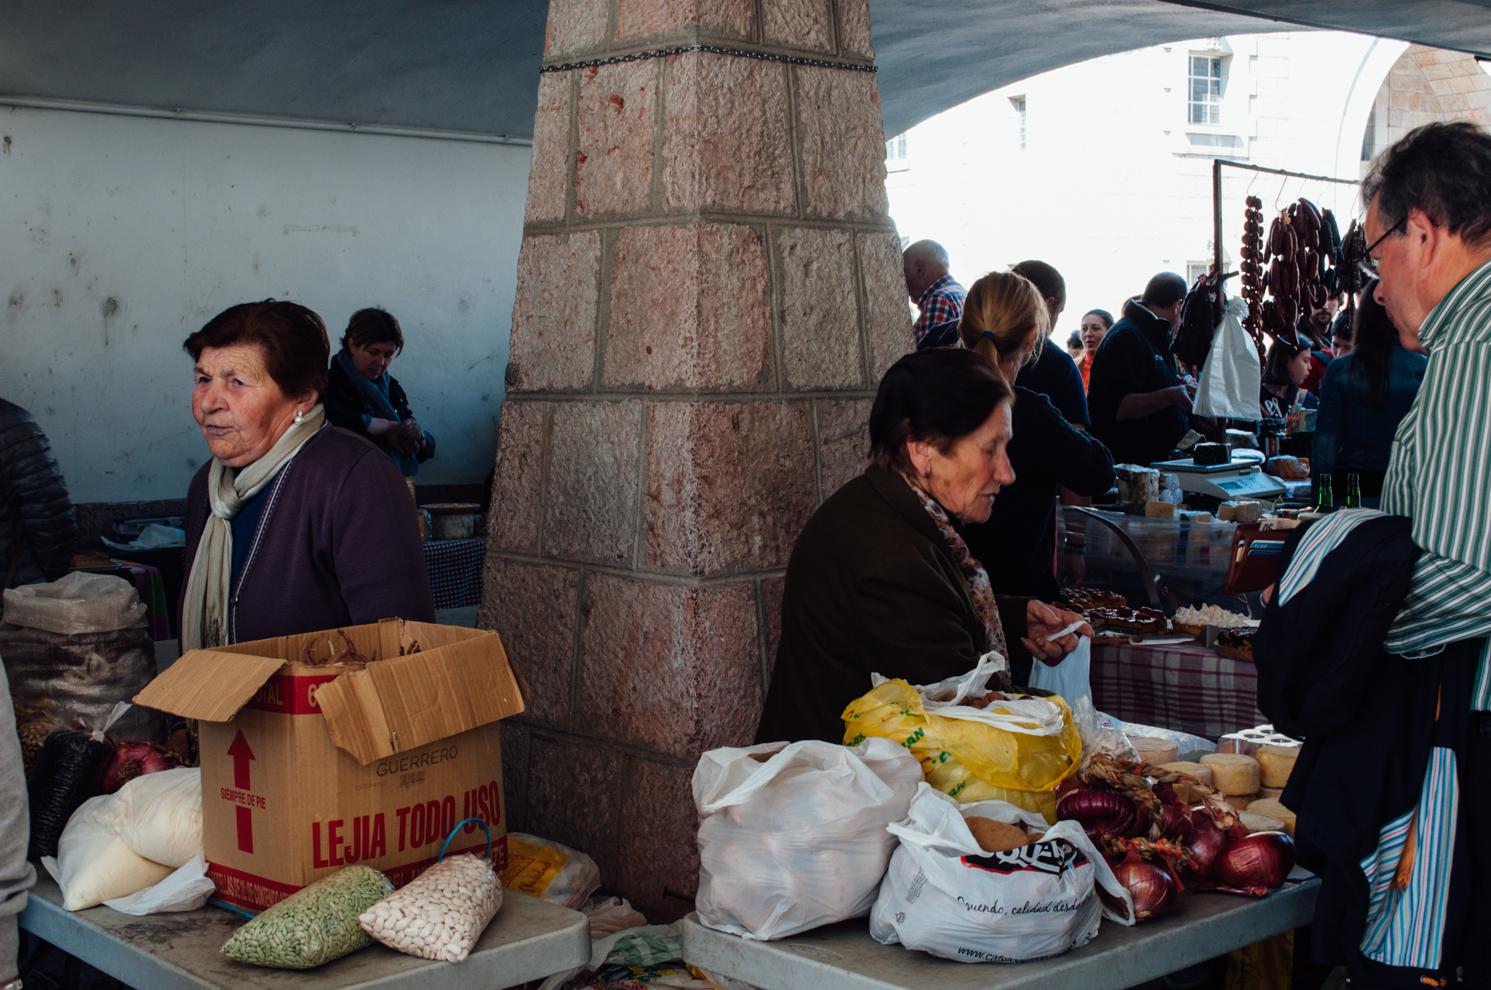 Mercado_de_Cangas_de_Onis_by_MonicaRGoya-18.jpg